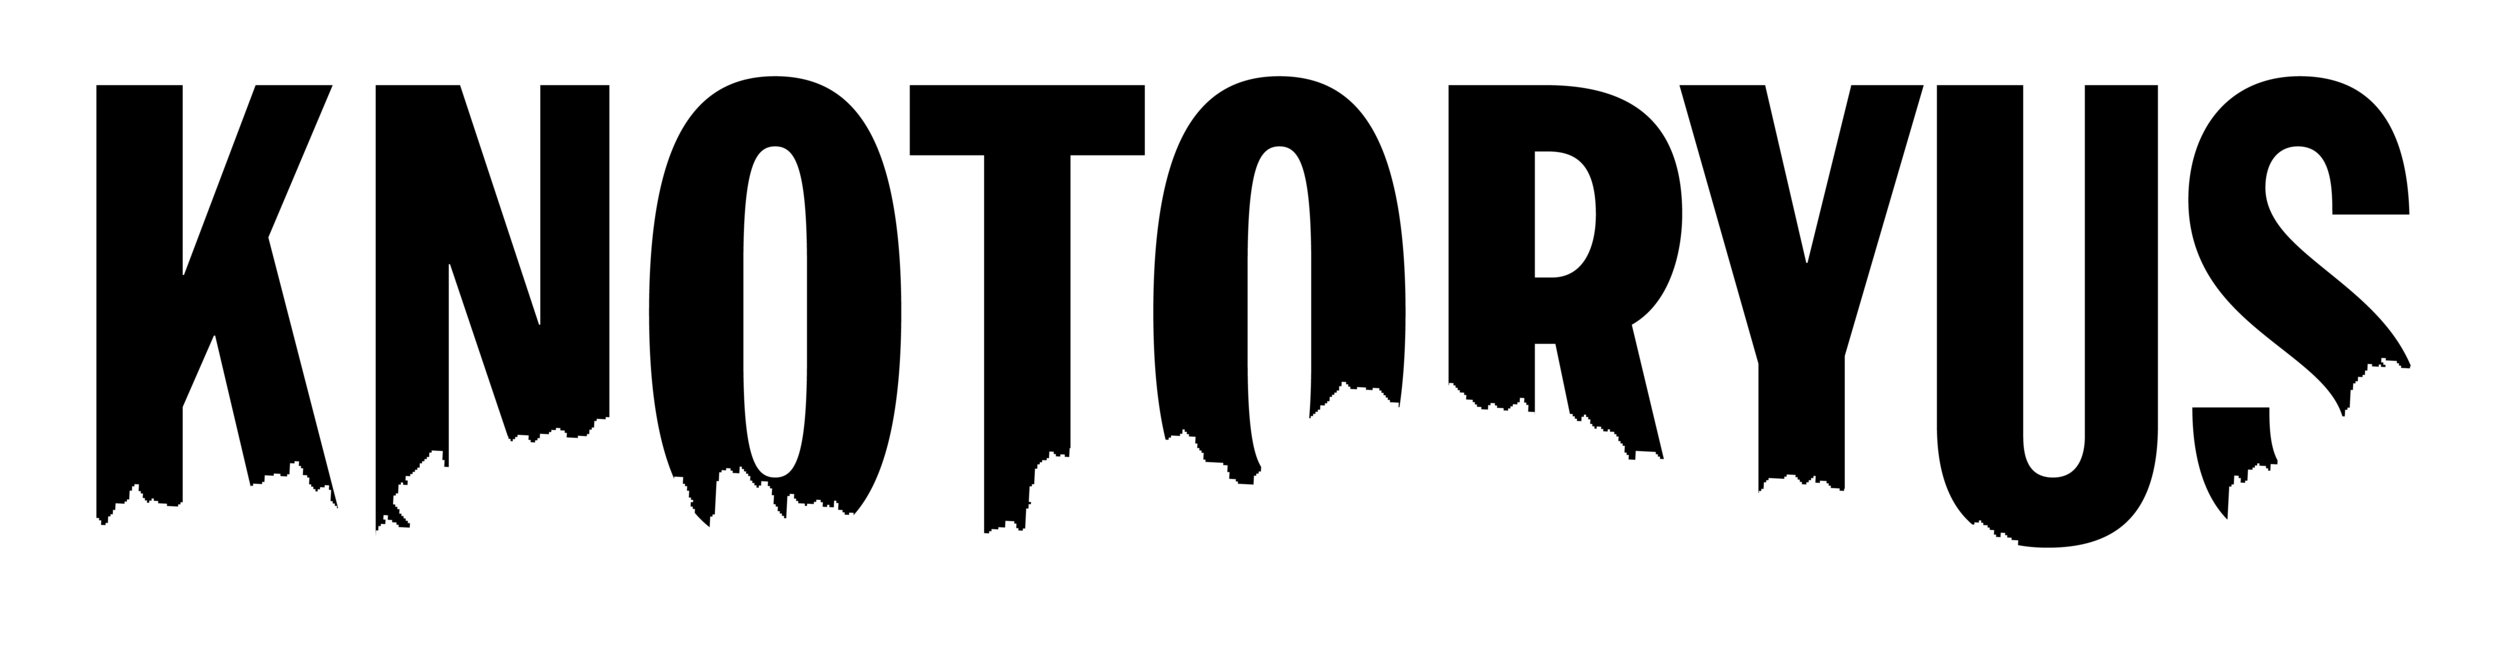 © 2017 KNOTORYUS logo by Paul Boudens